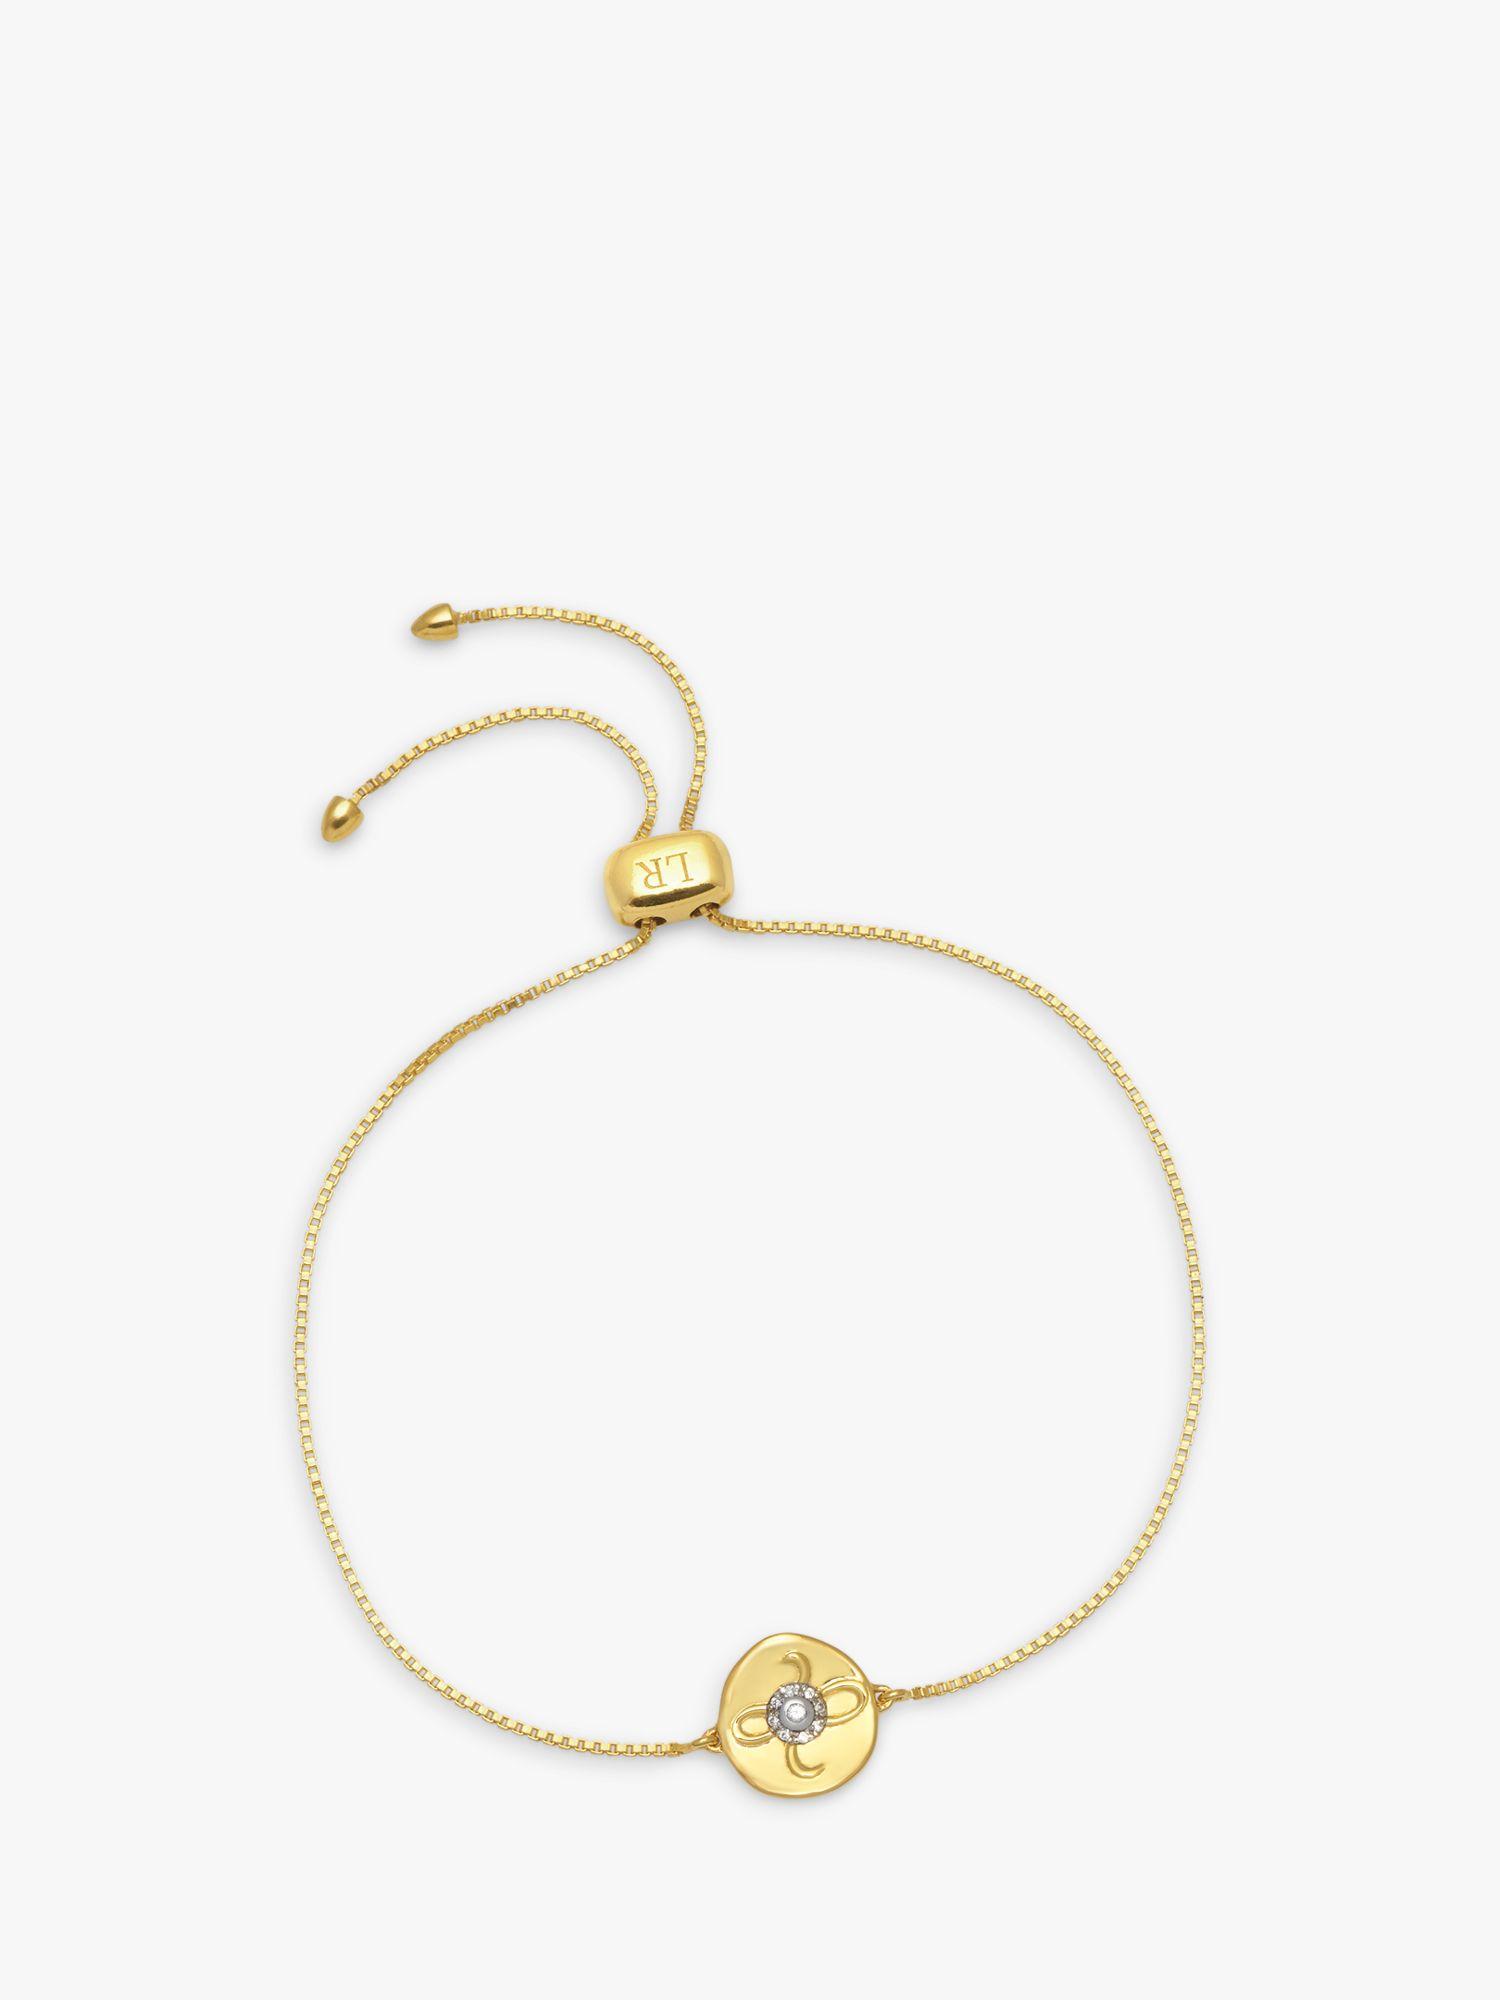 Lola Rose Lola Rose Curio Zircon Friendship Charm Coin Slider Chain Bracelet, Gold